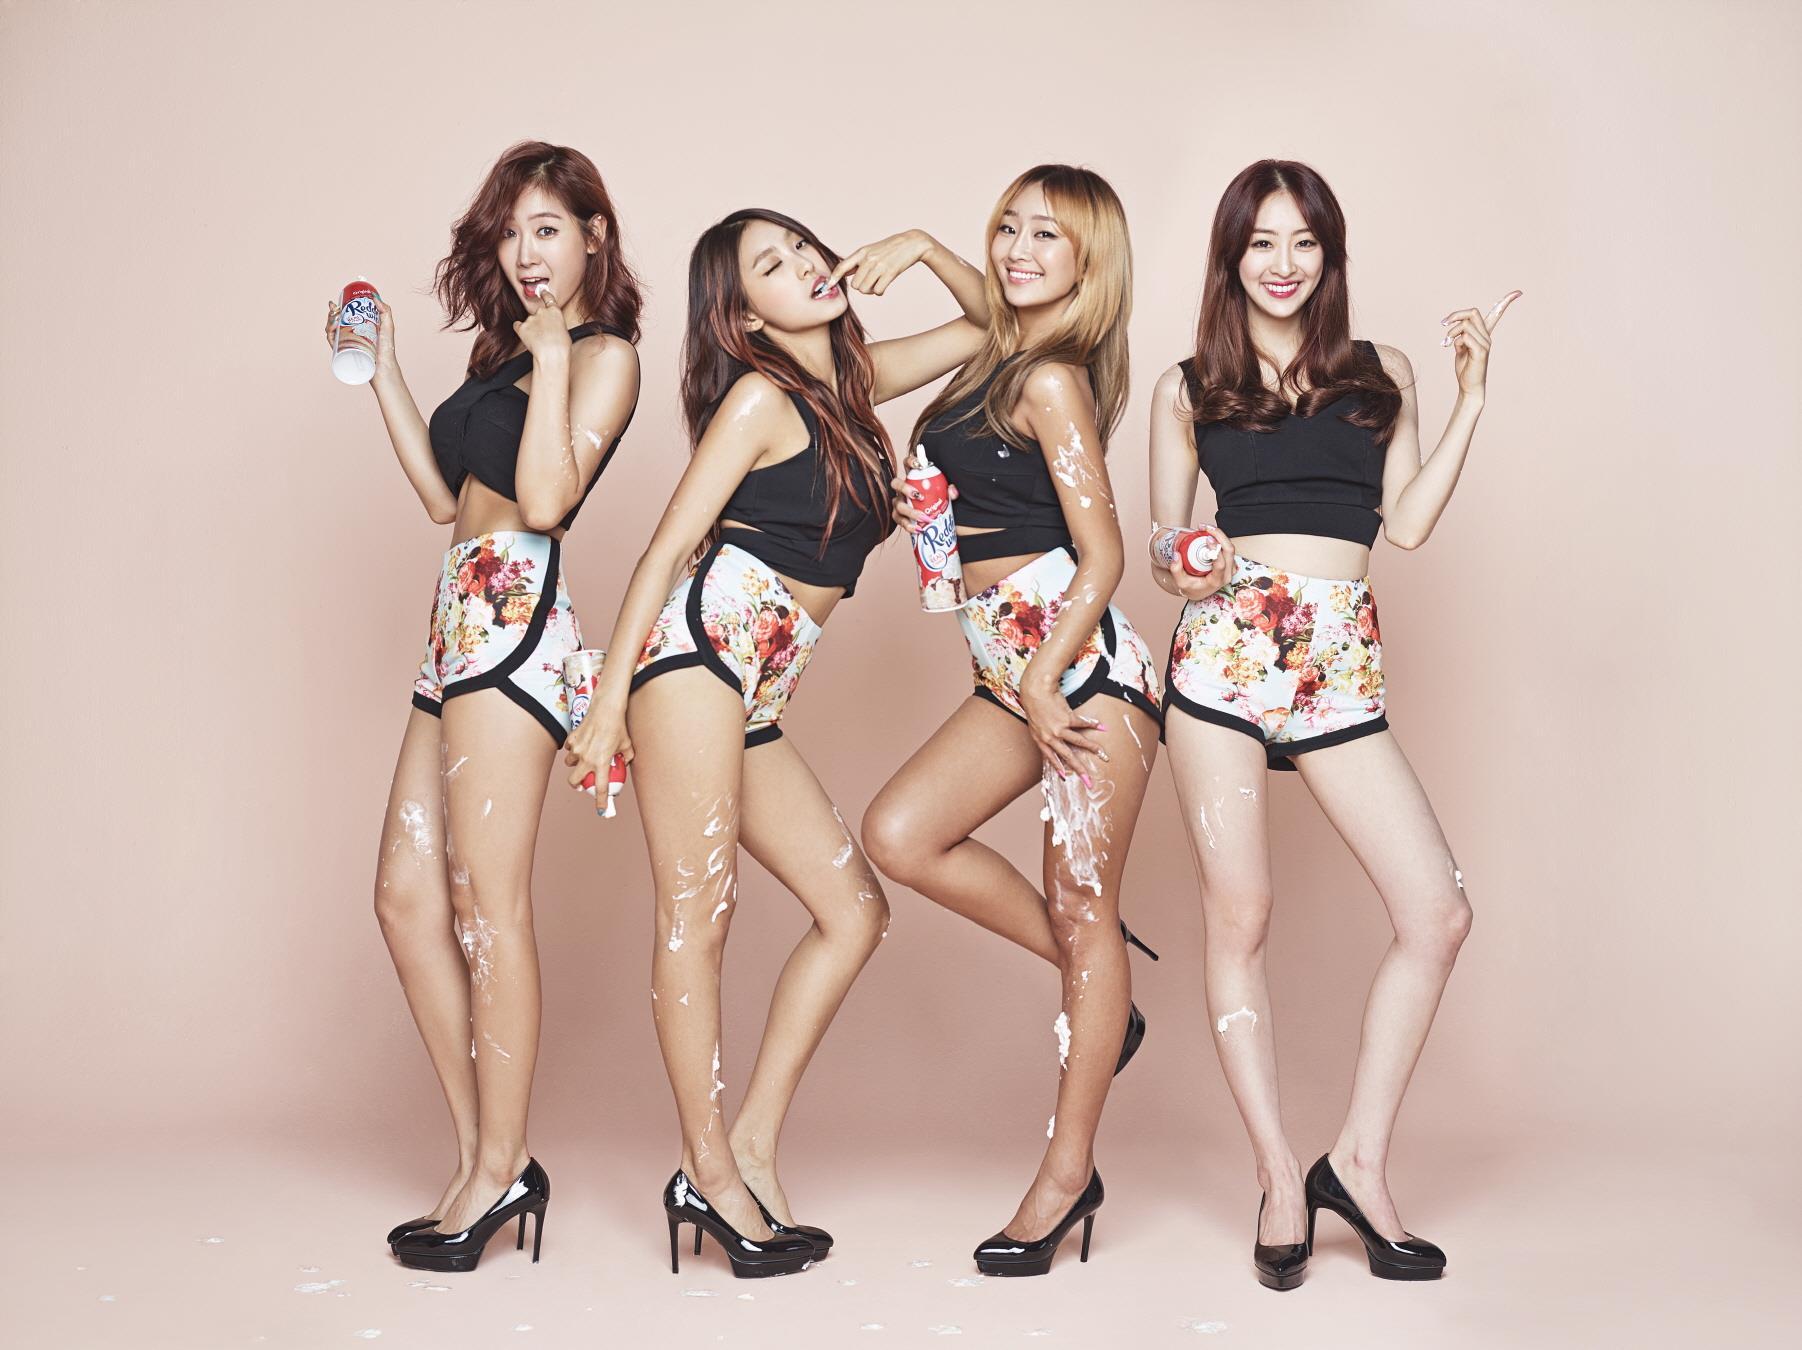 ★ SISTAR :: 196 天 ★  實力派女團 SISTAR 在 2010 年出道,同年便以第三張單曲《How Dare You》獲得一位的肯定,從此之後,SISTAR 不僅團體活動,就連 solo 活動、小分隊、合唱曲都首首榜上有名呢!